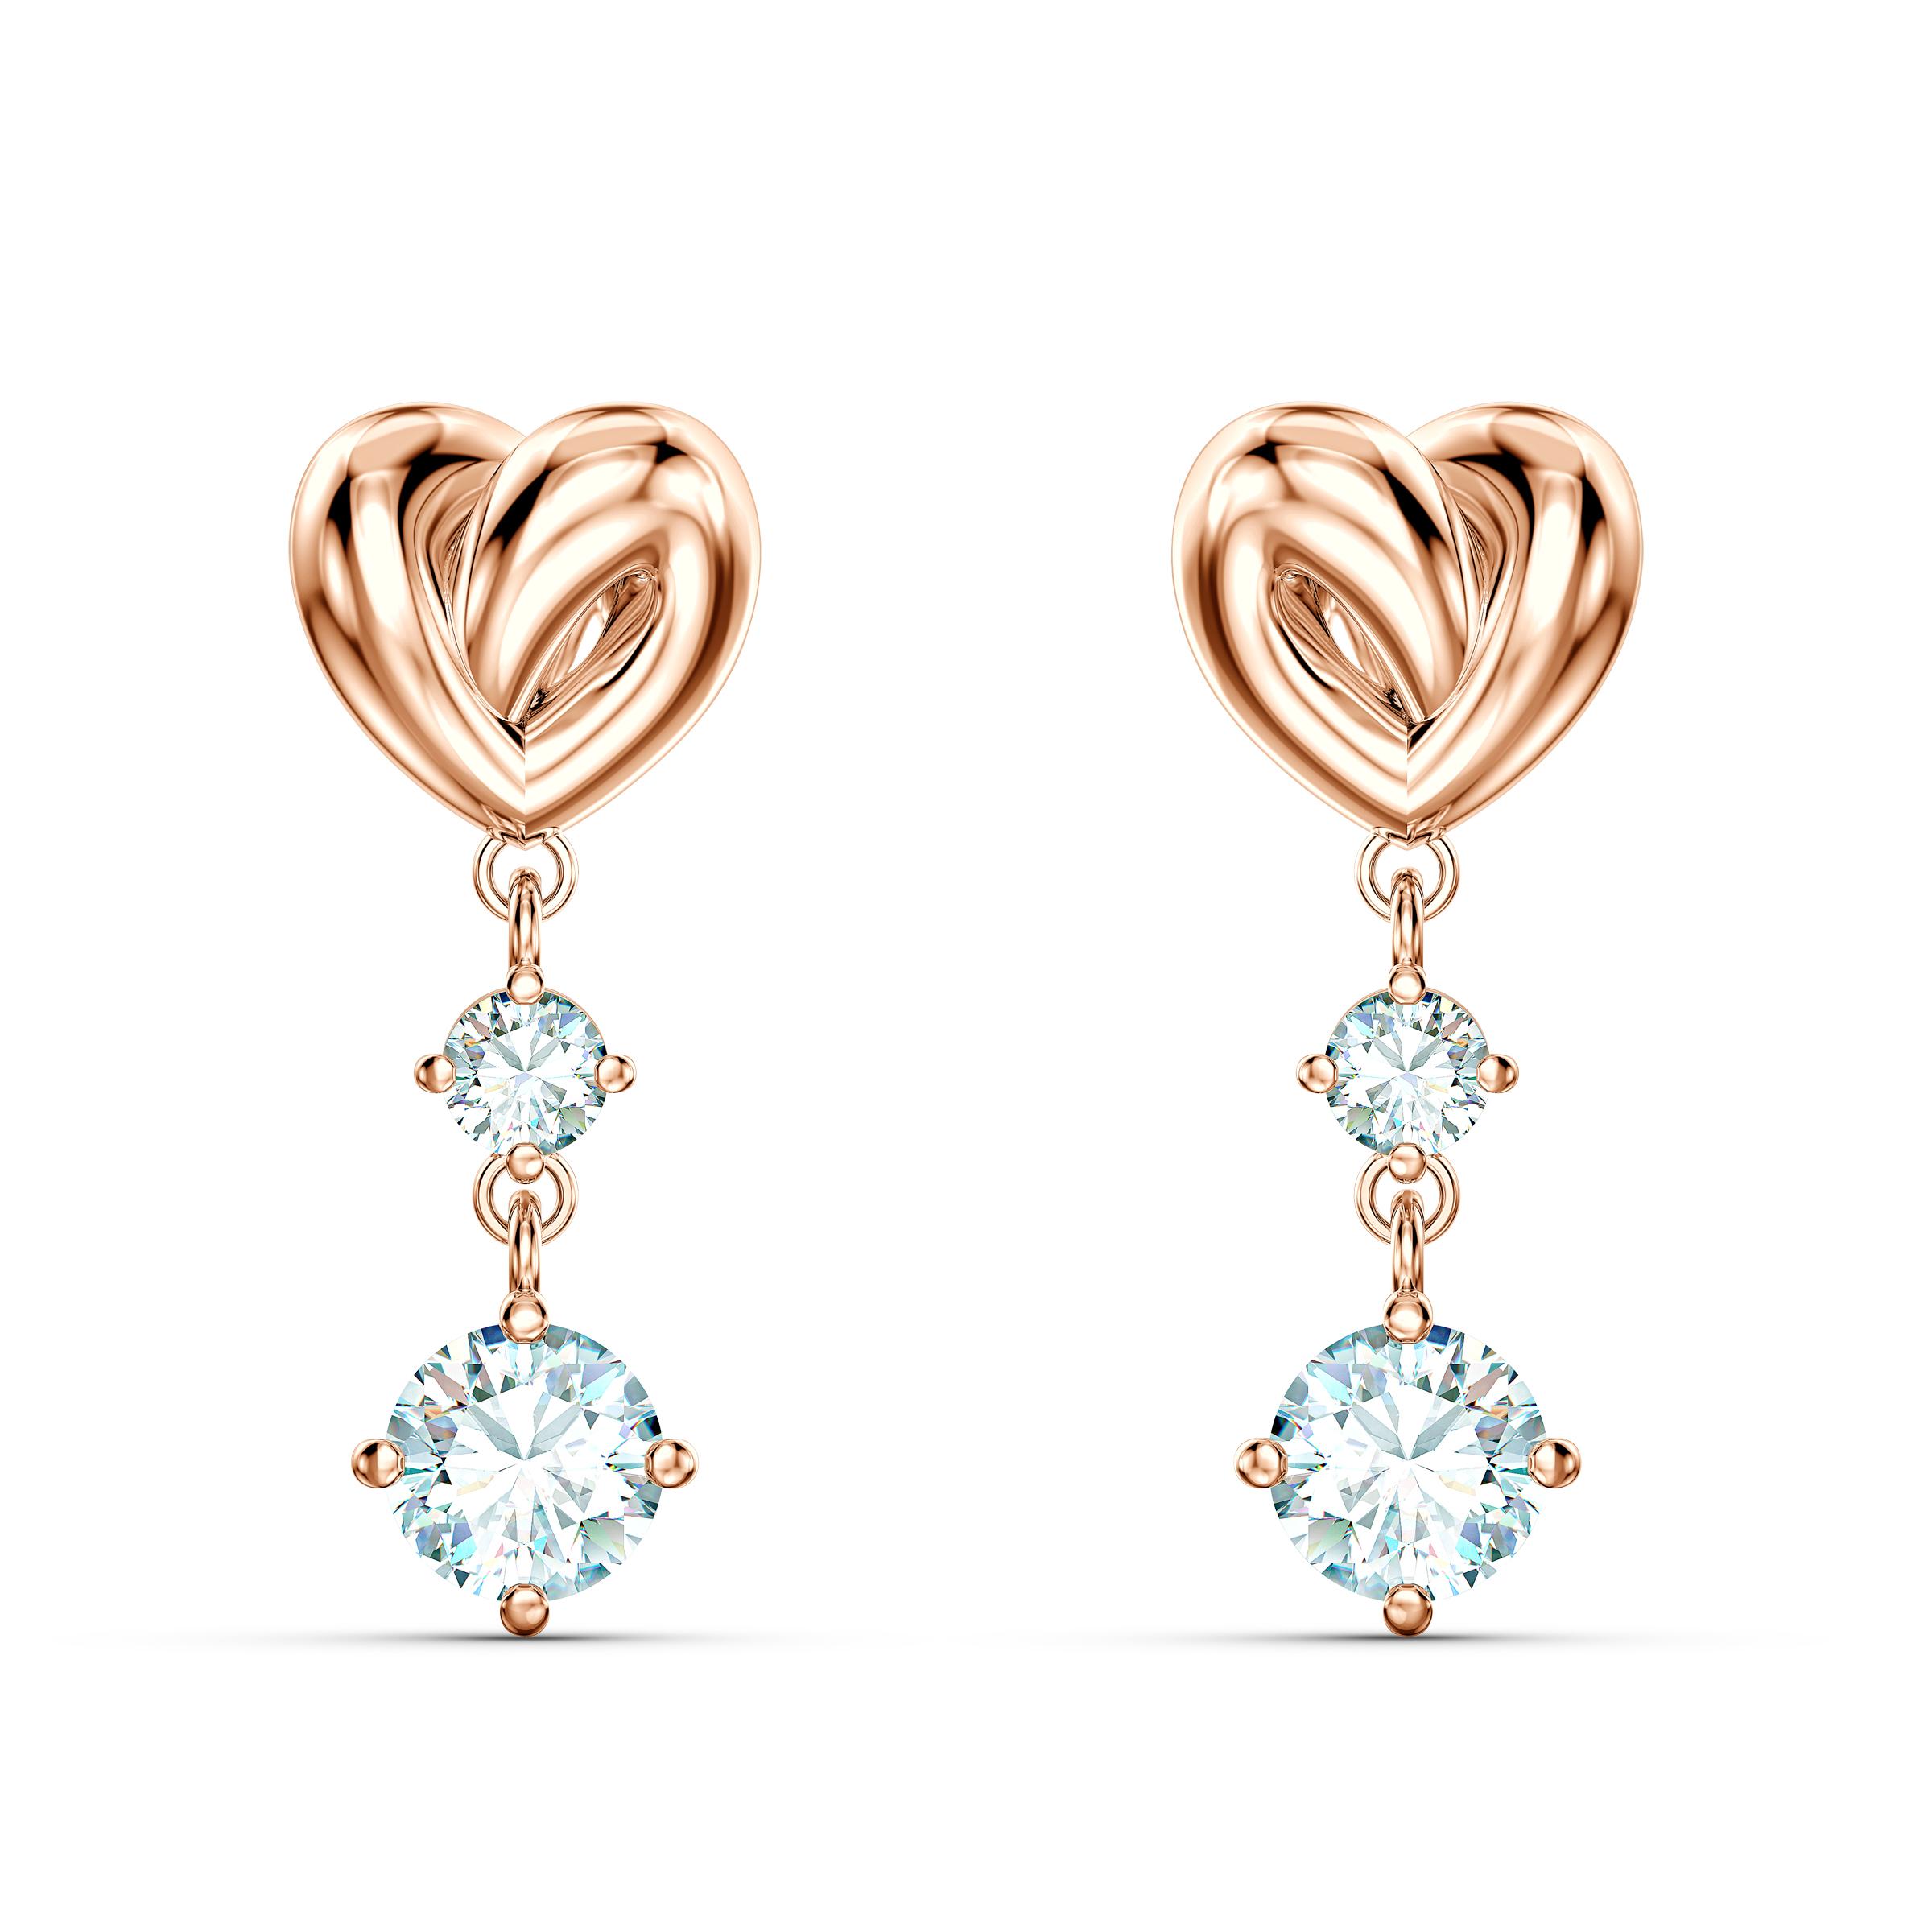 Boucles d'oreilles Lifelong Heart, blanc, métal doré rose, Swarovski